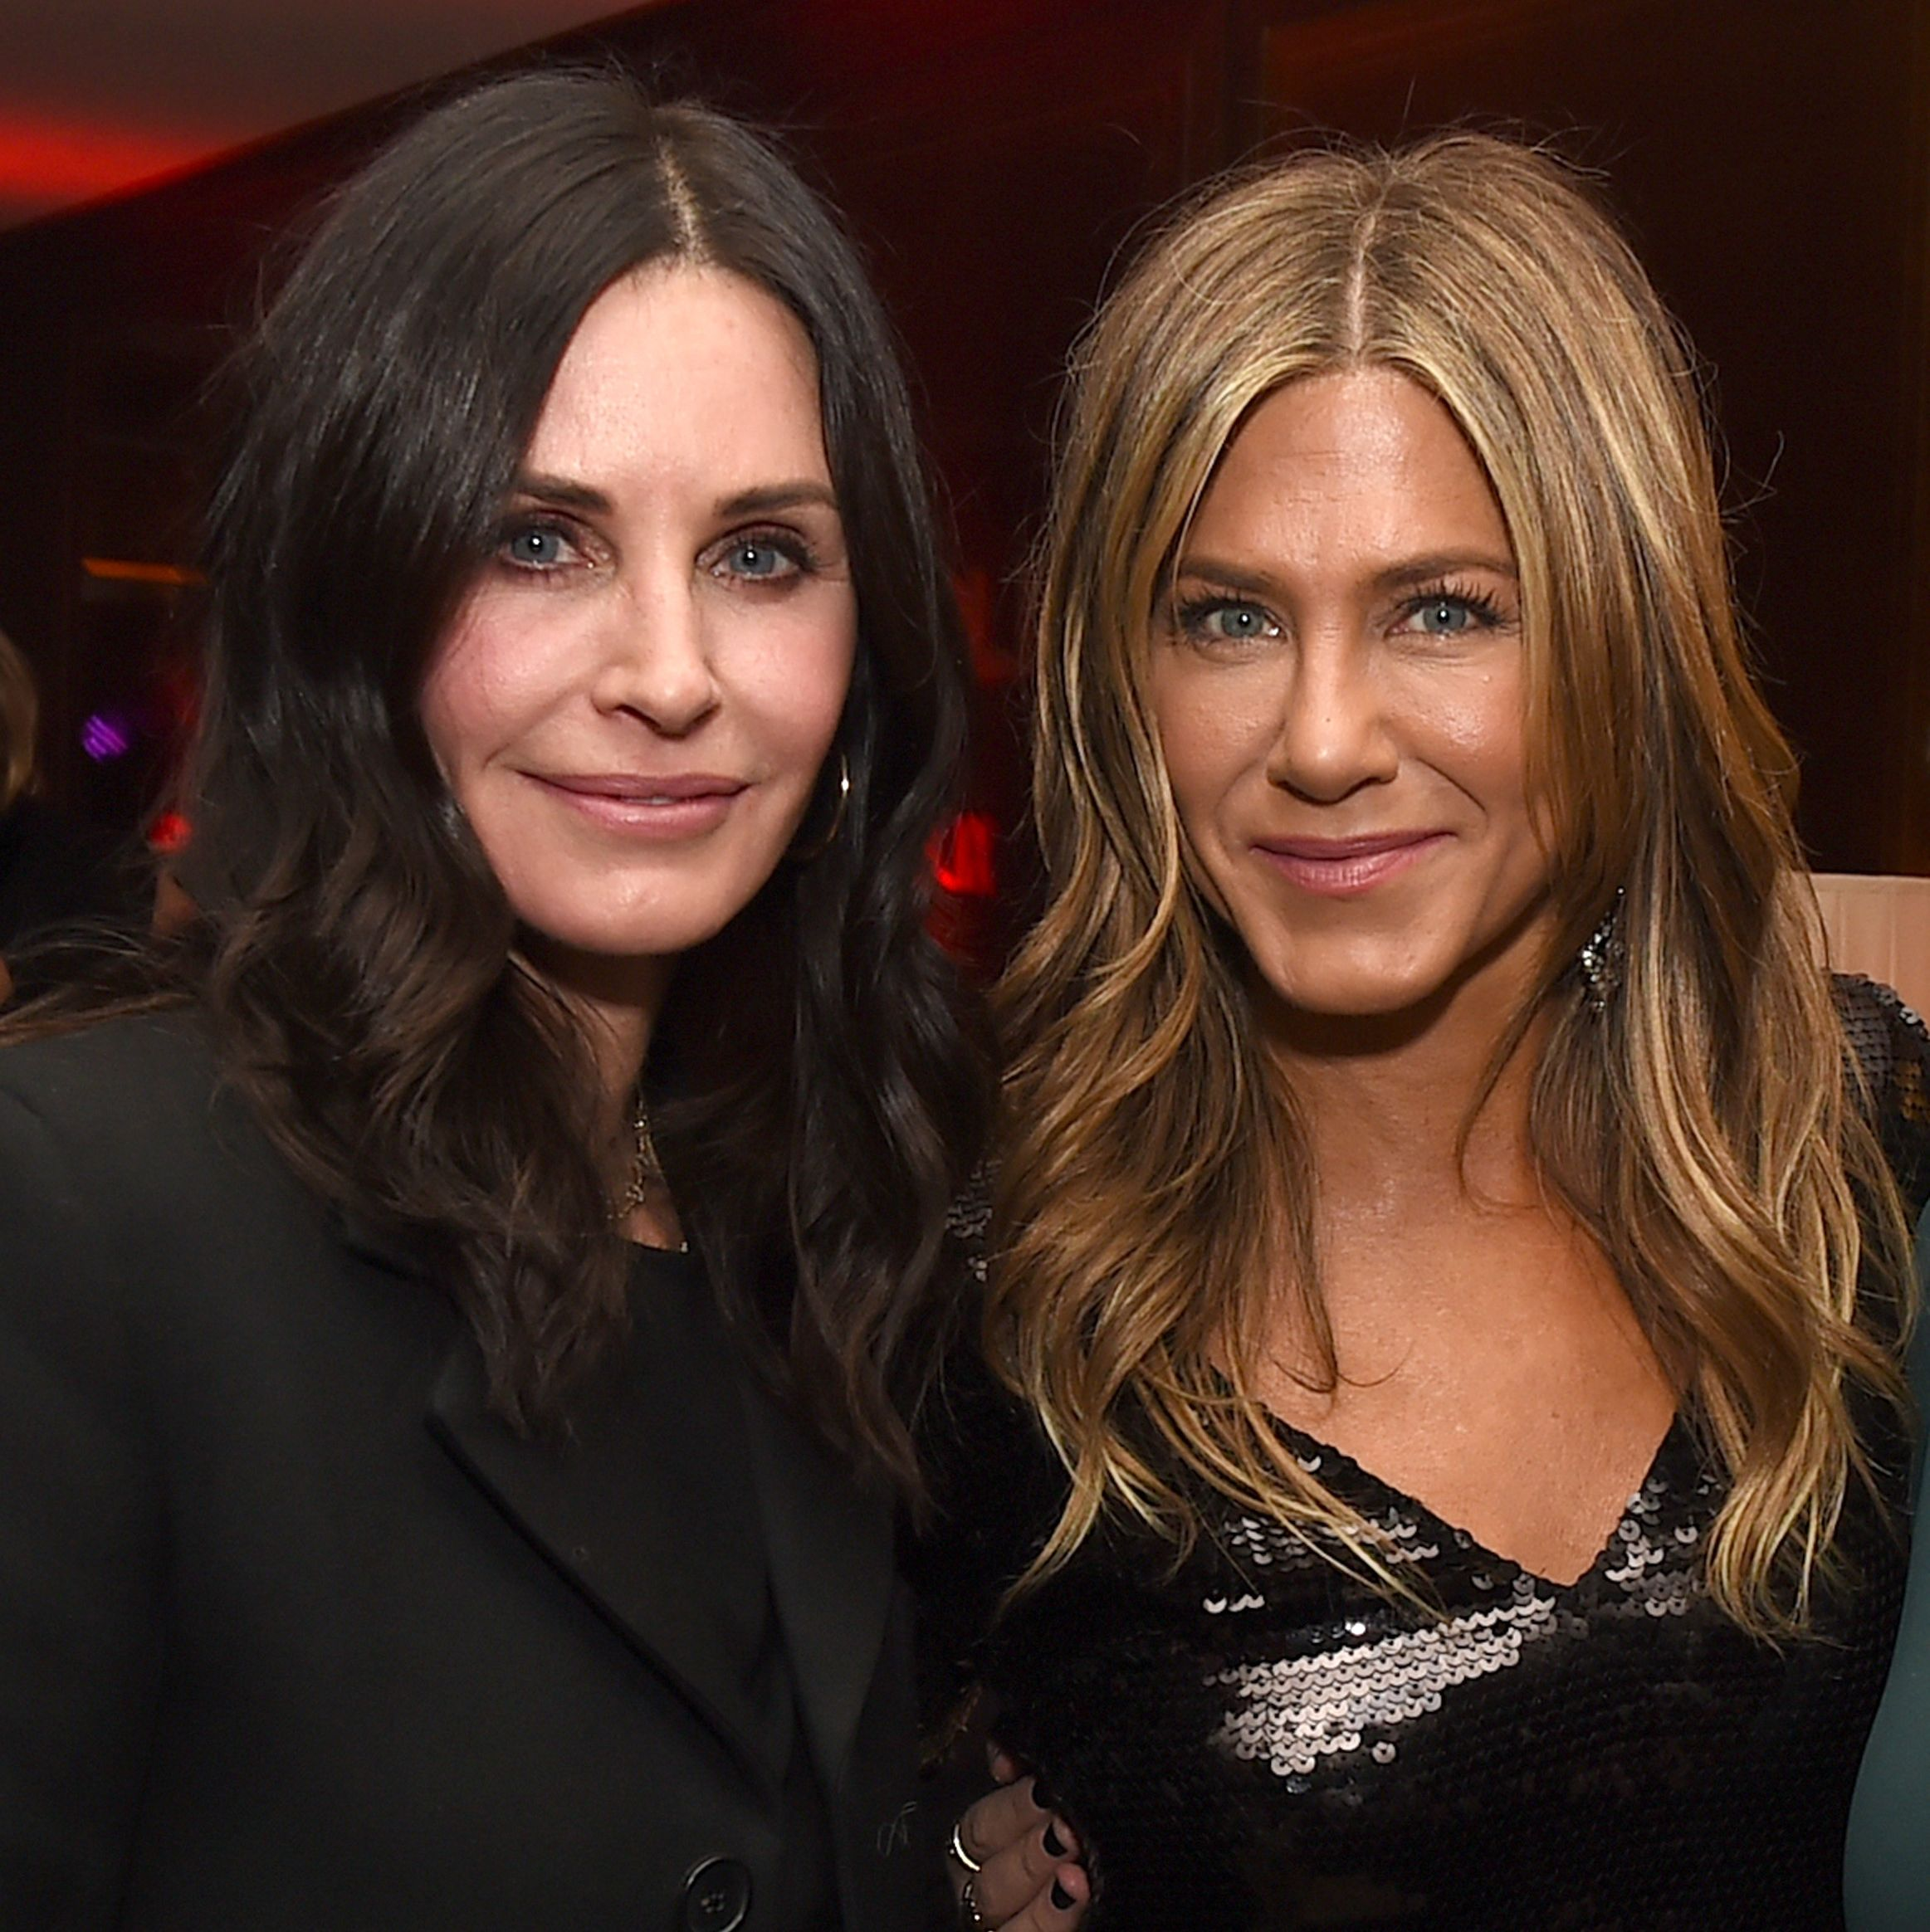 Jennifer Aniston and Courtney Cox